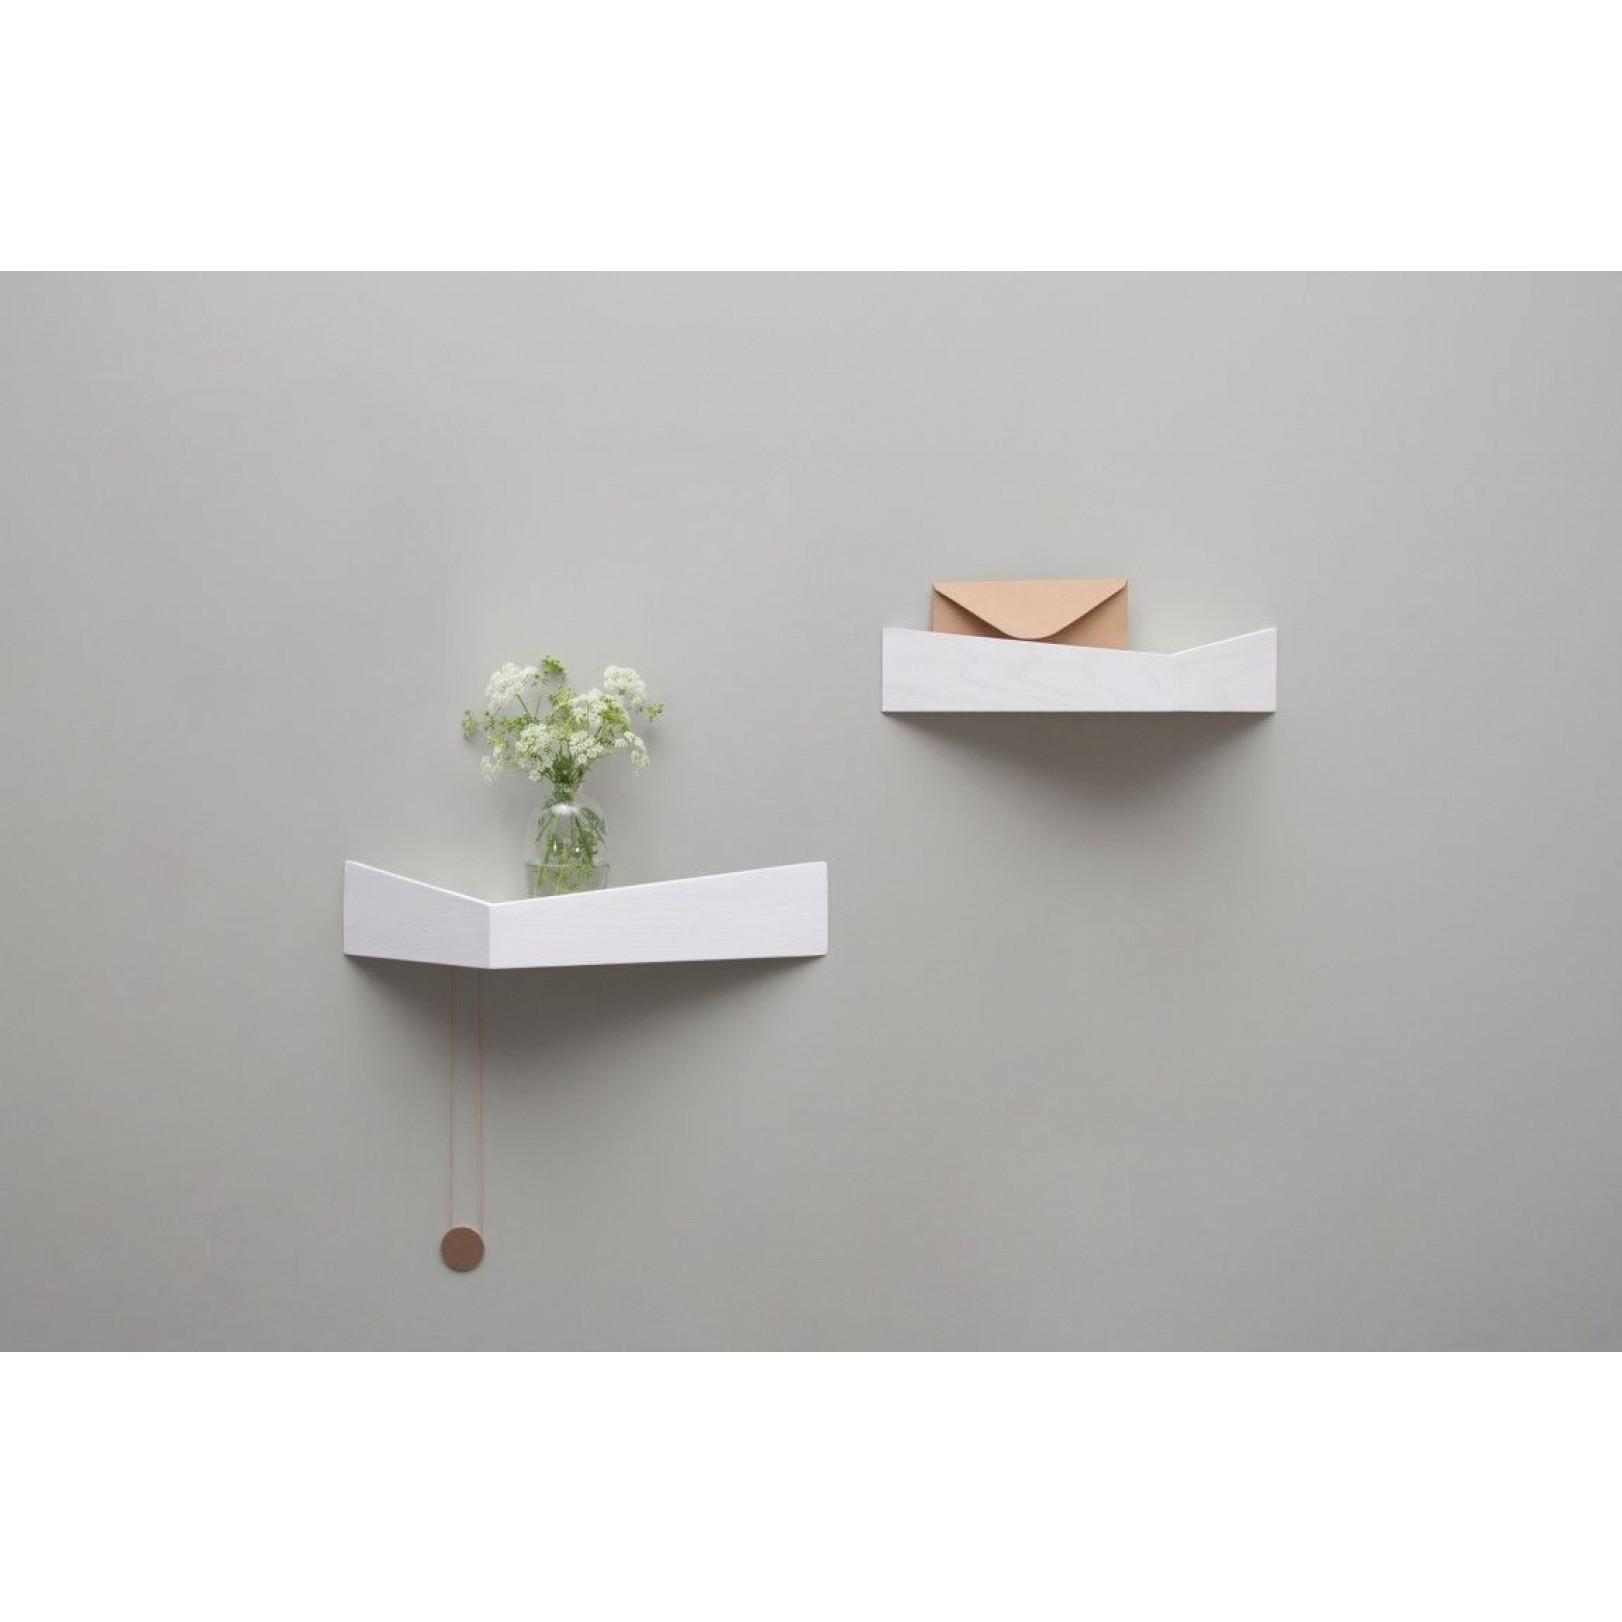 Shelves Small + Medium Set of 2 Pelican   White